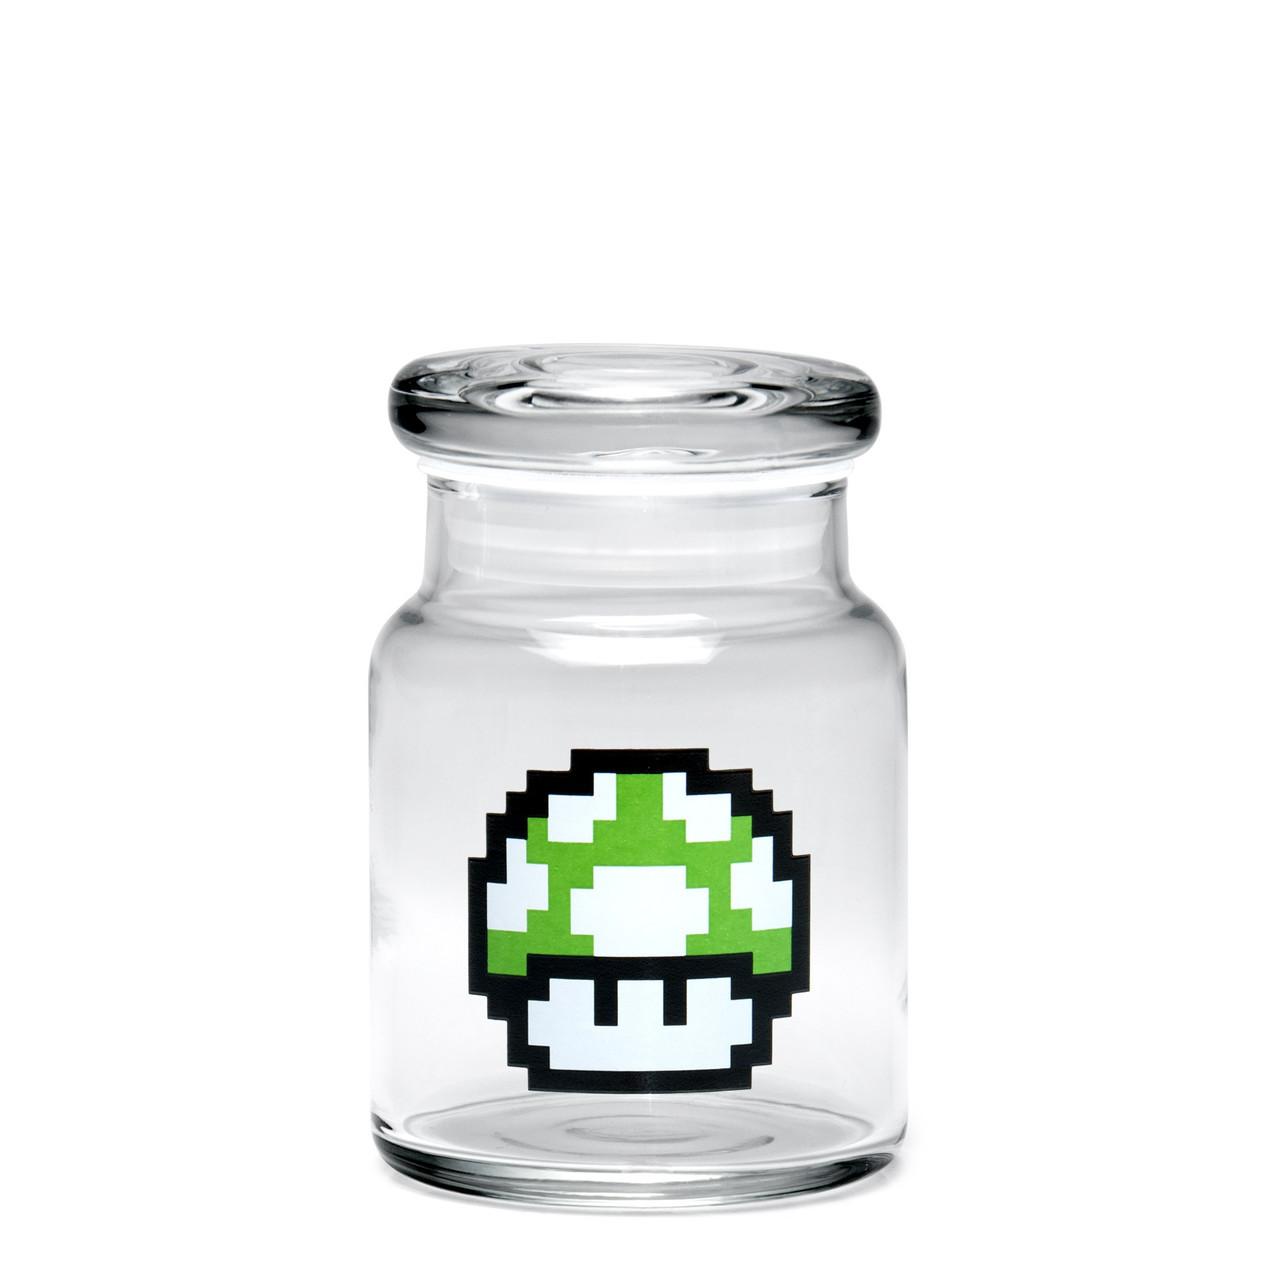 420 Science Small Pop-Top Jar - 1-Up Mushroom